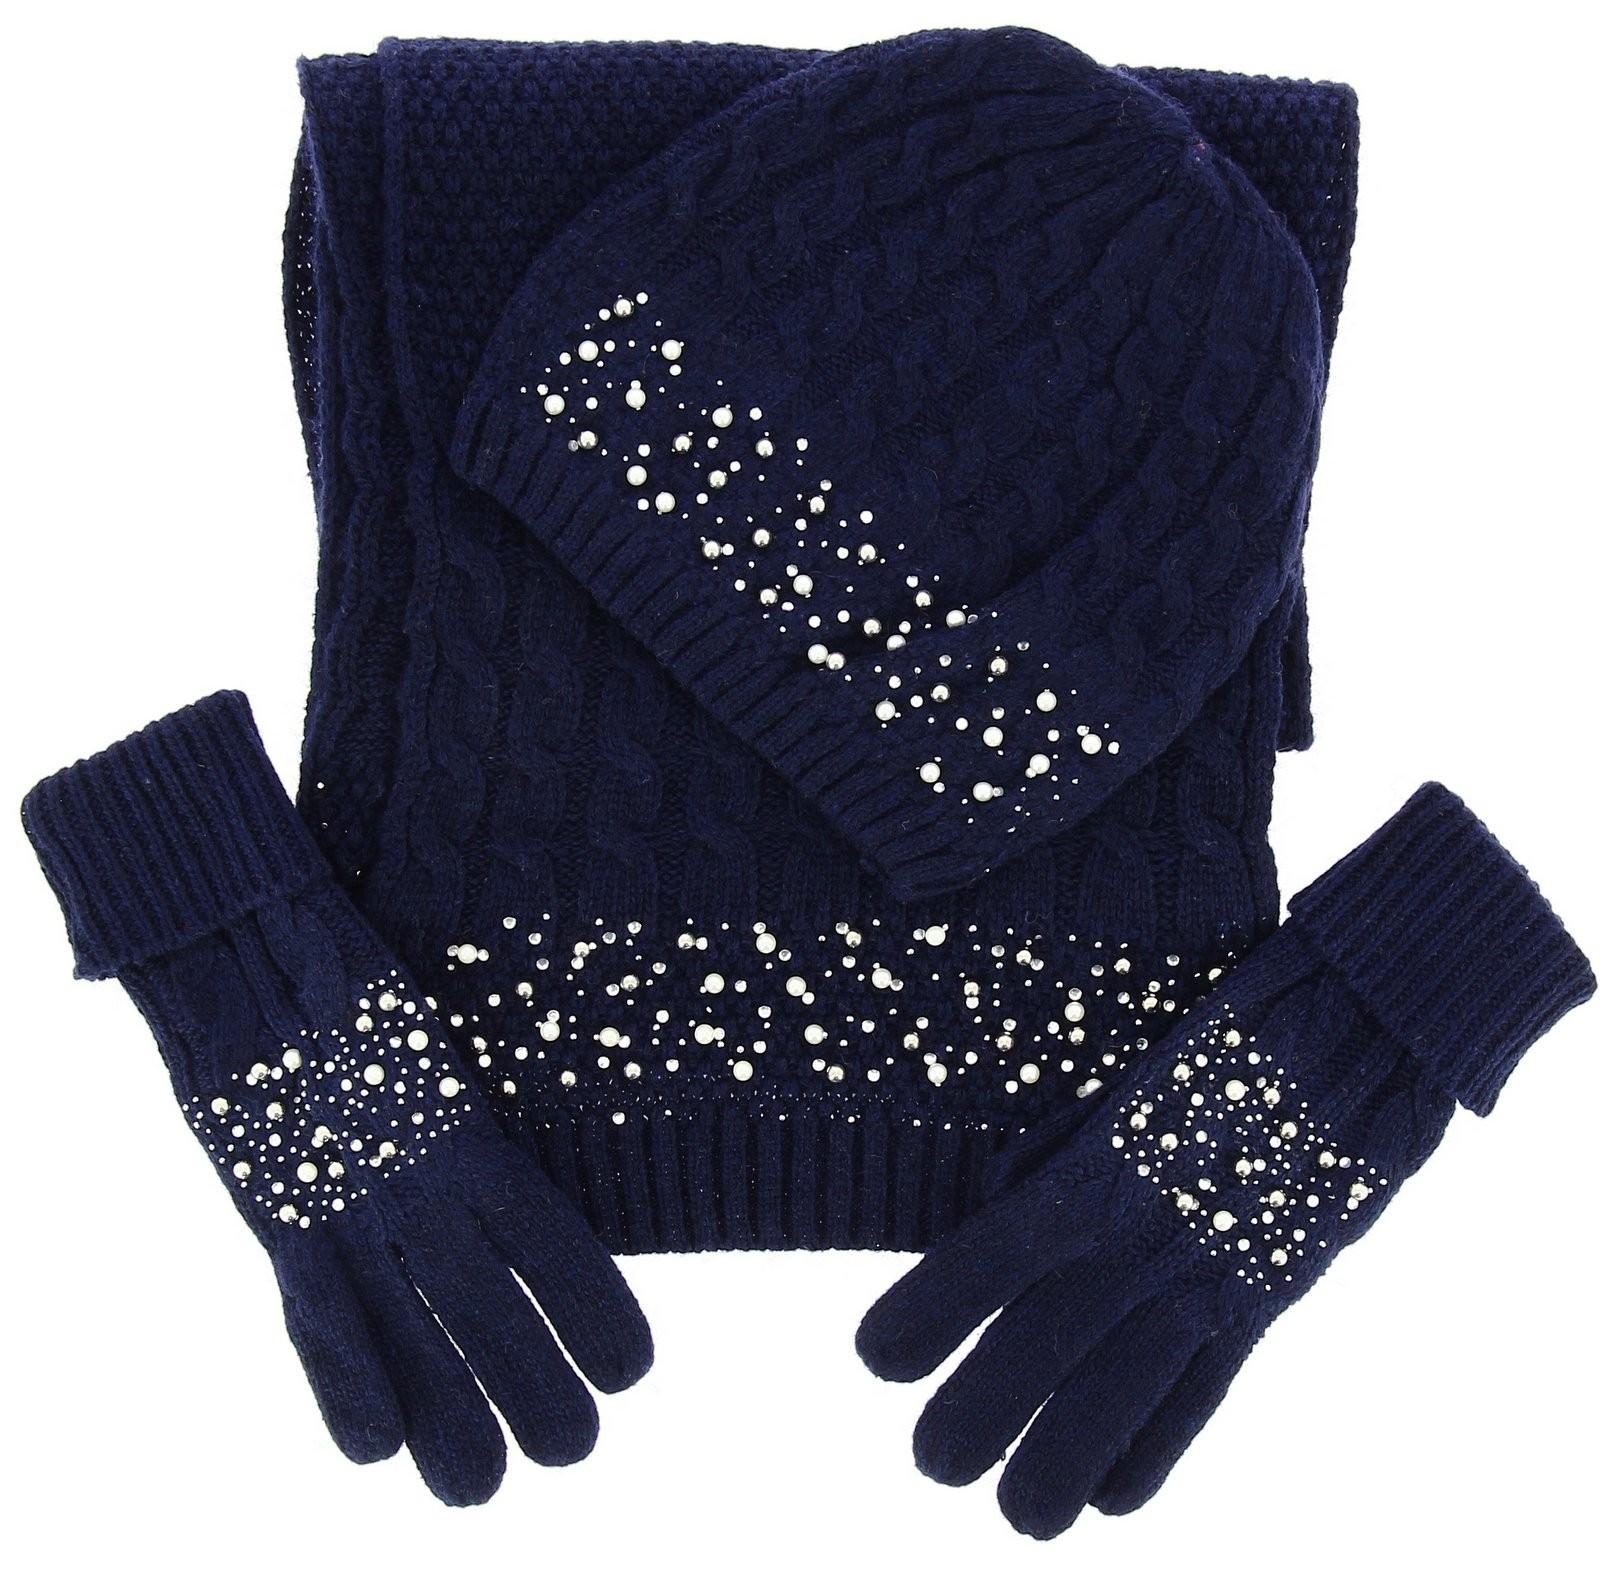 a80e6a74006 ensemble bonnet gants echarpe beatrice bleu marine laine perles